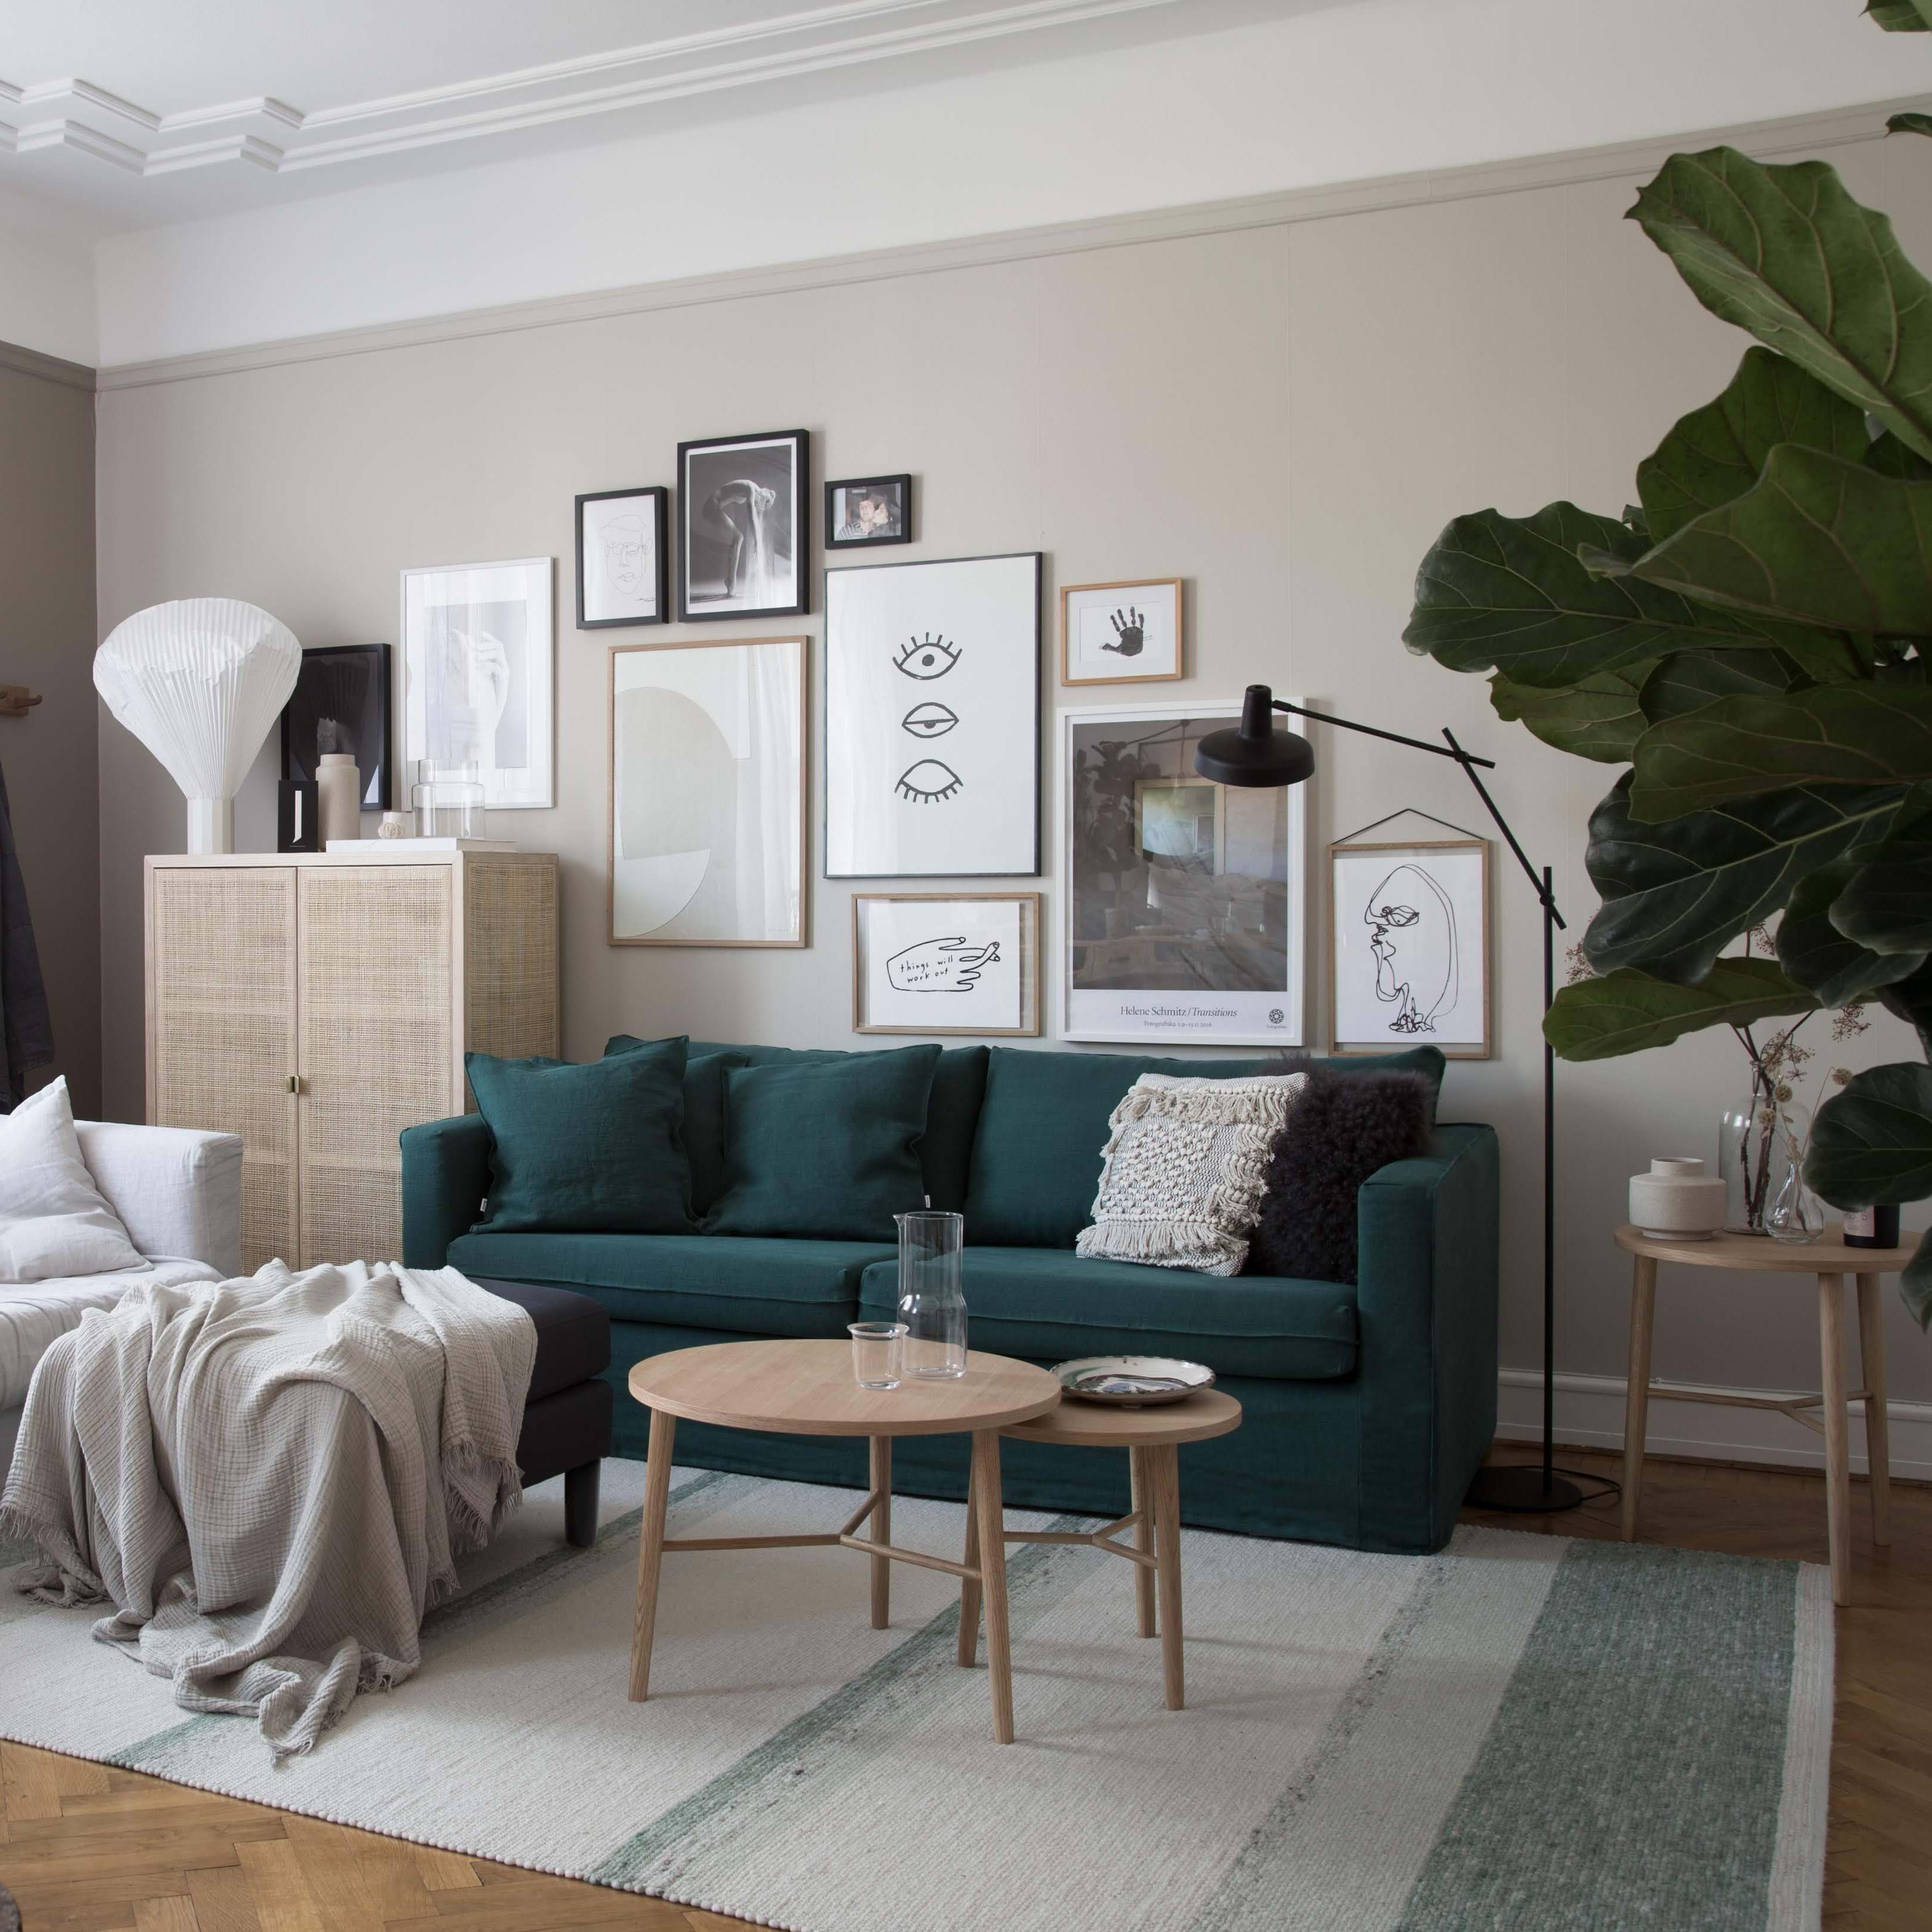 My Scandinavian Home's IKEA Karlstad sofa style makeover | Bemz